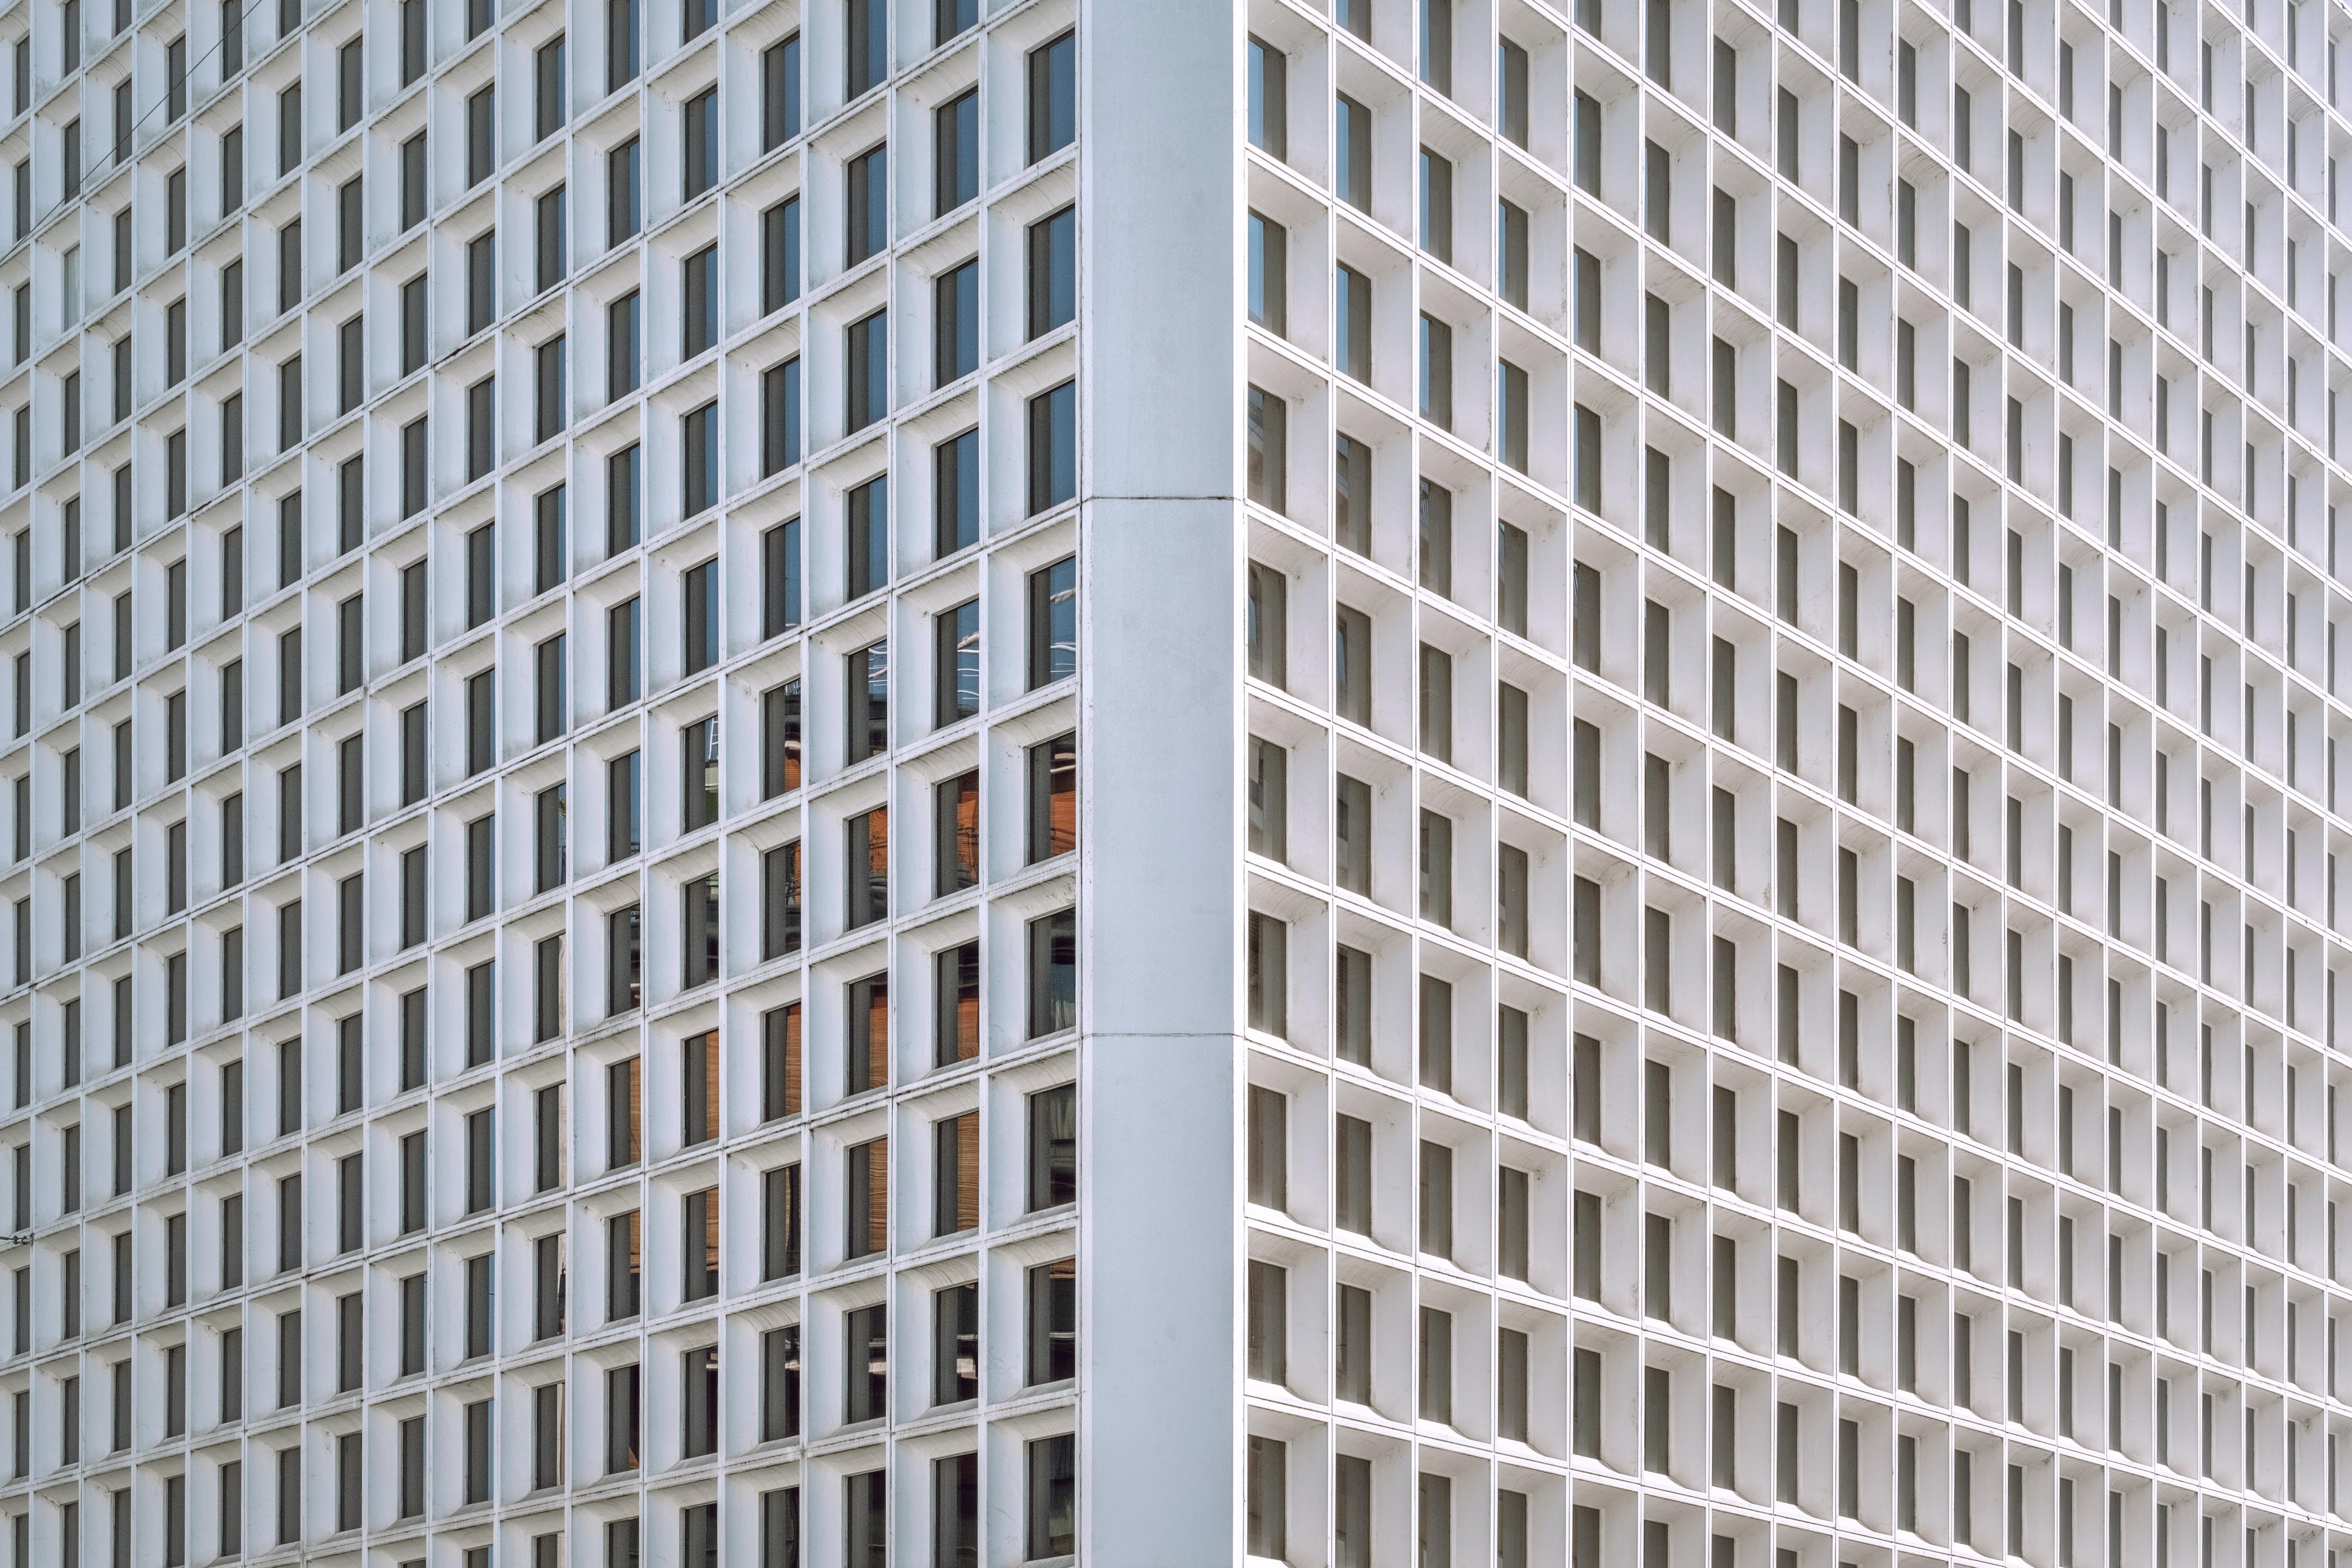 The corner of a white office building in Geneva